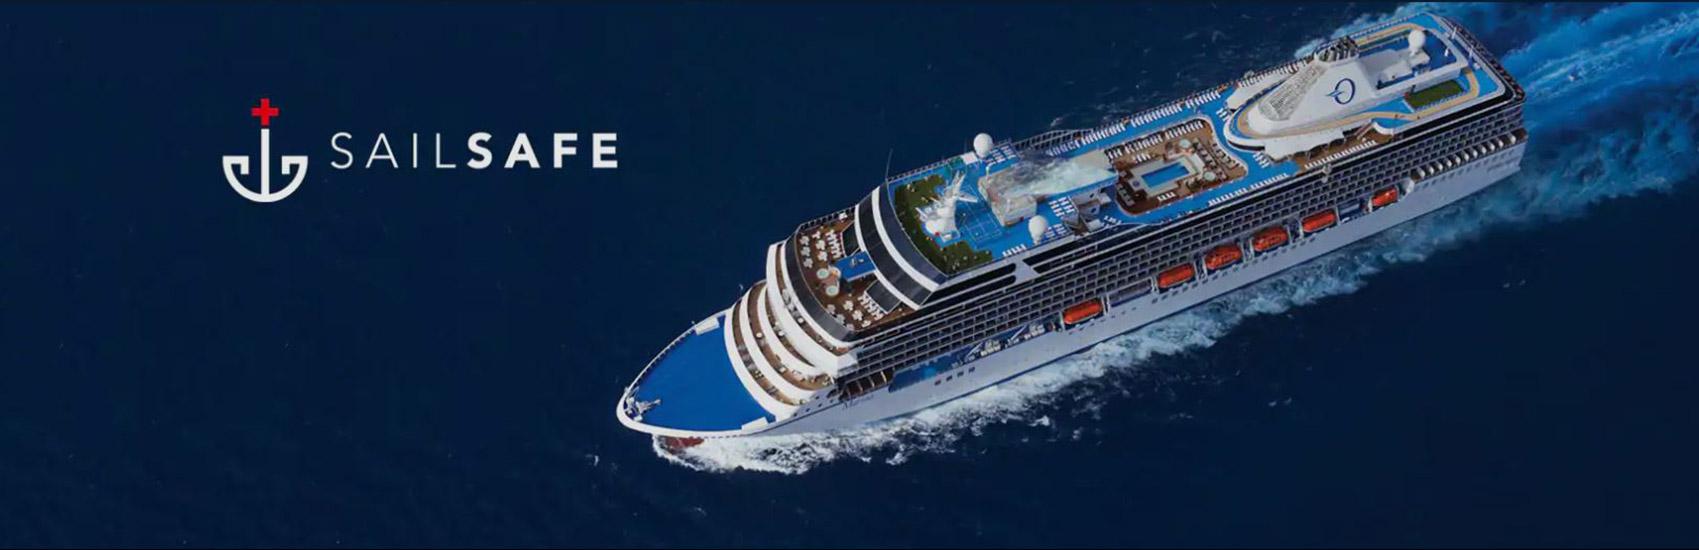 Oceania Cruises New Enhanced Health & Safety Protocols 0